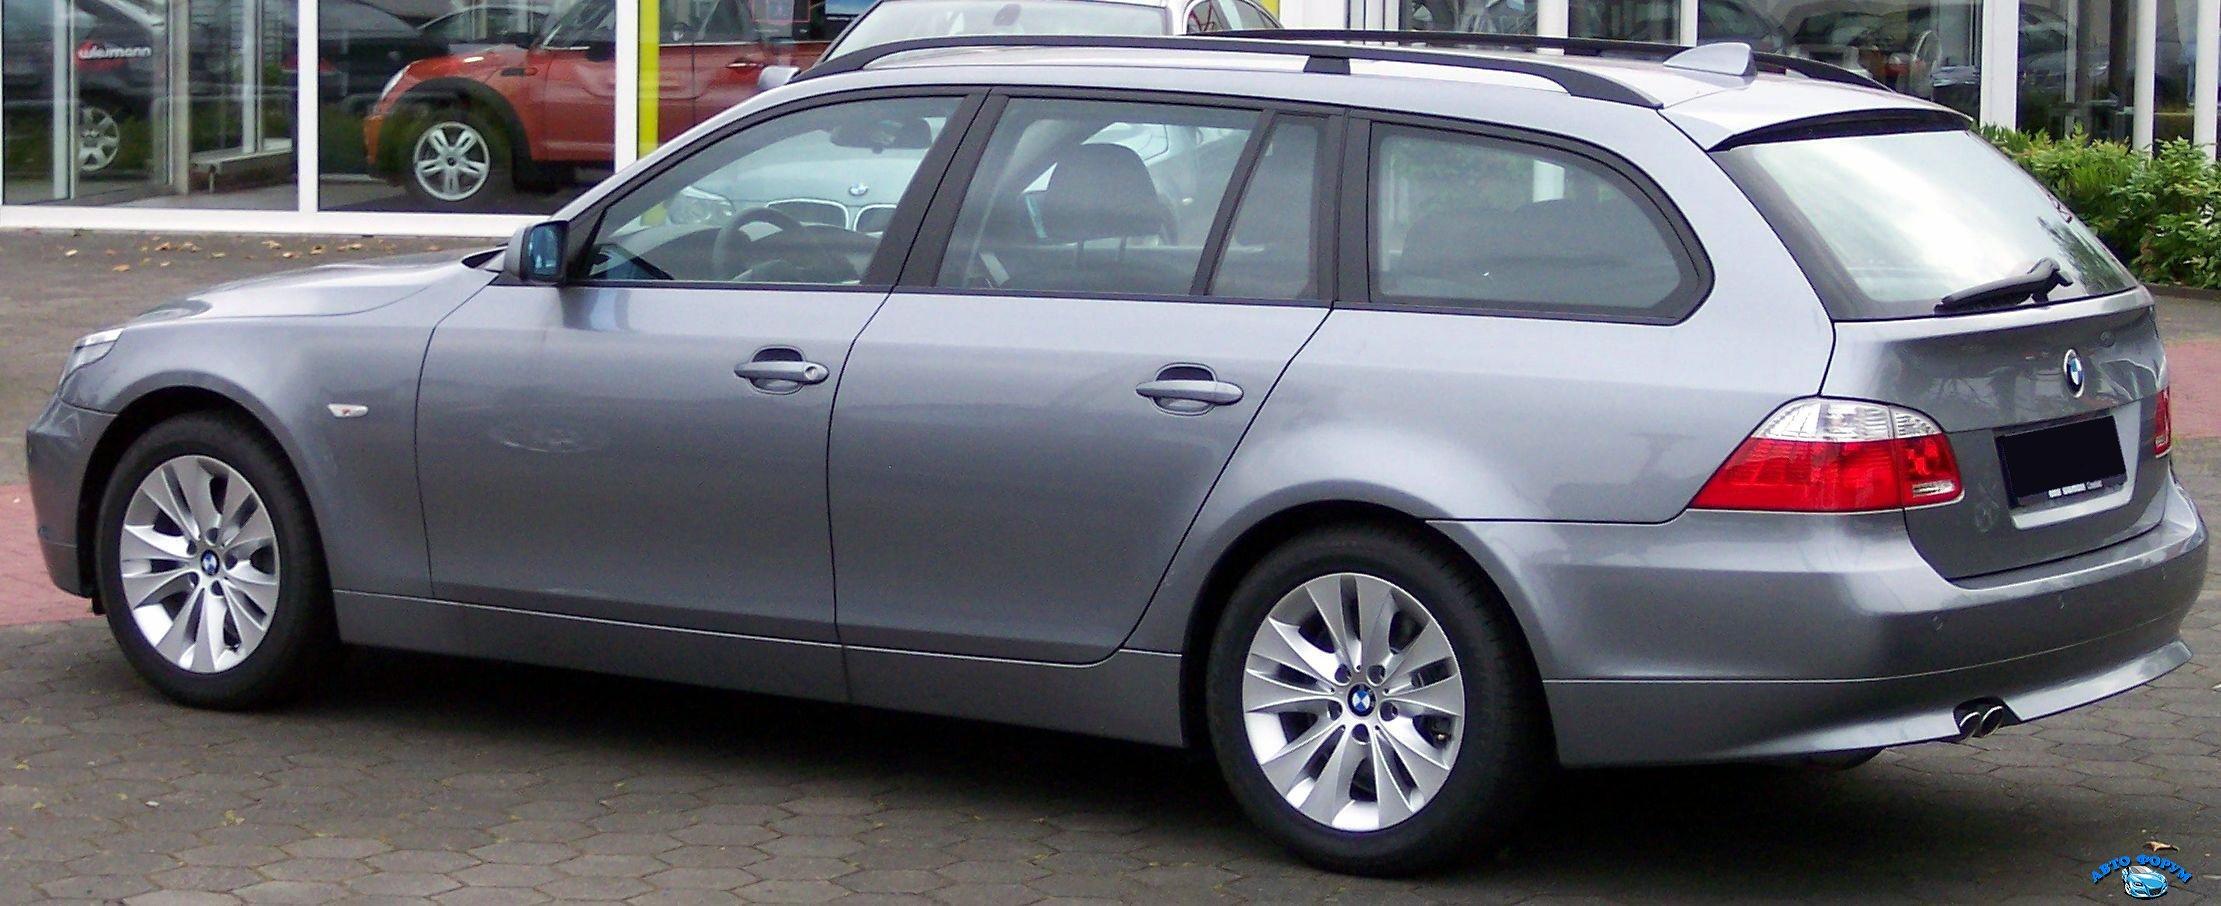 BMW_Series5_silver_hl.jpg